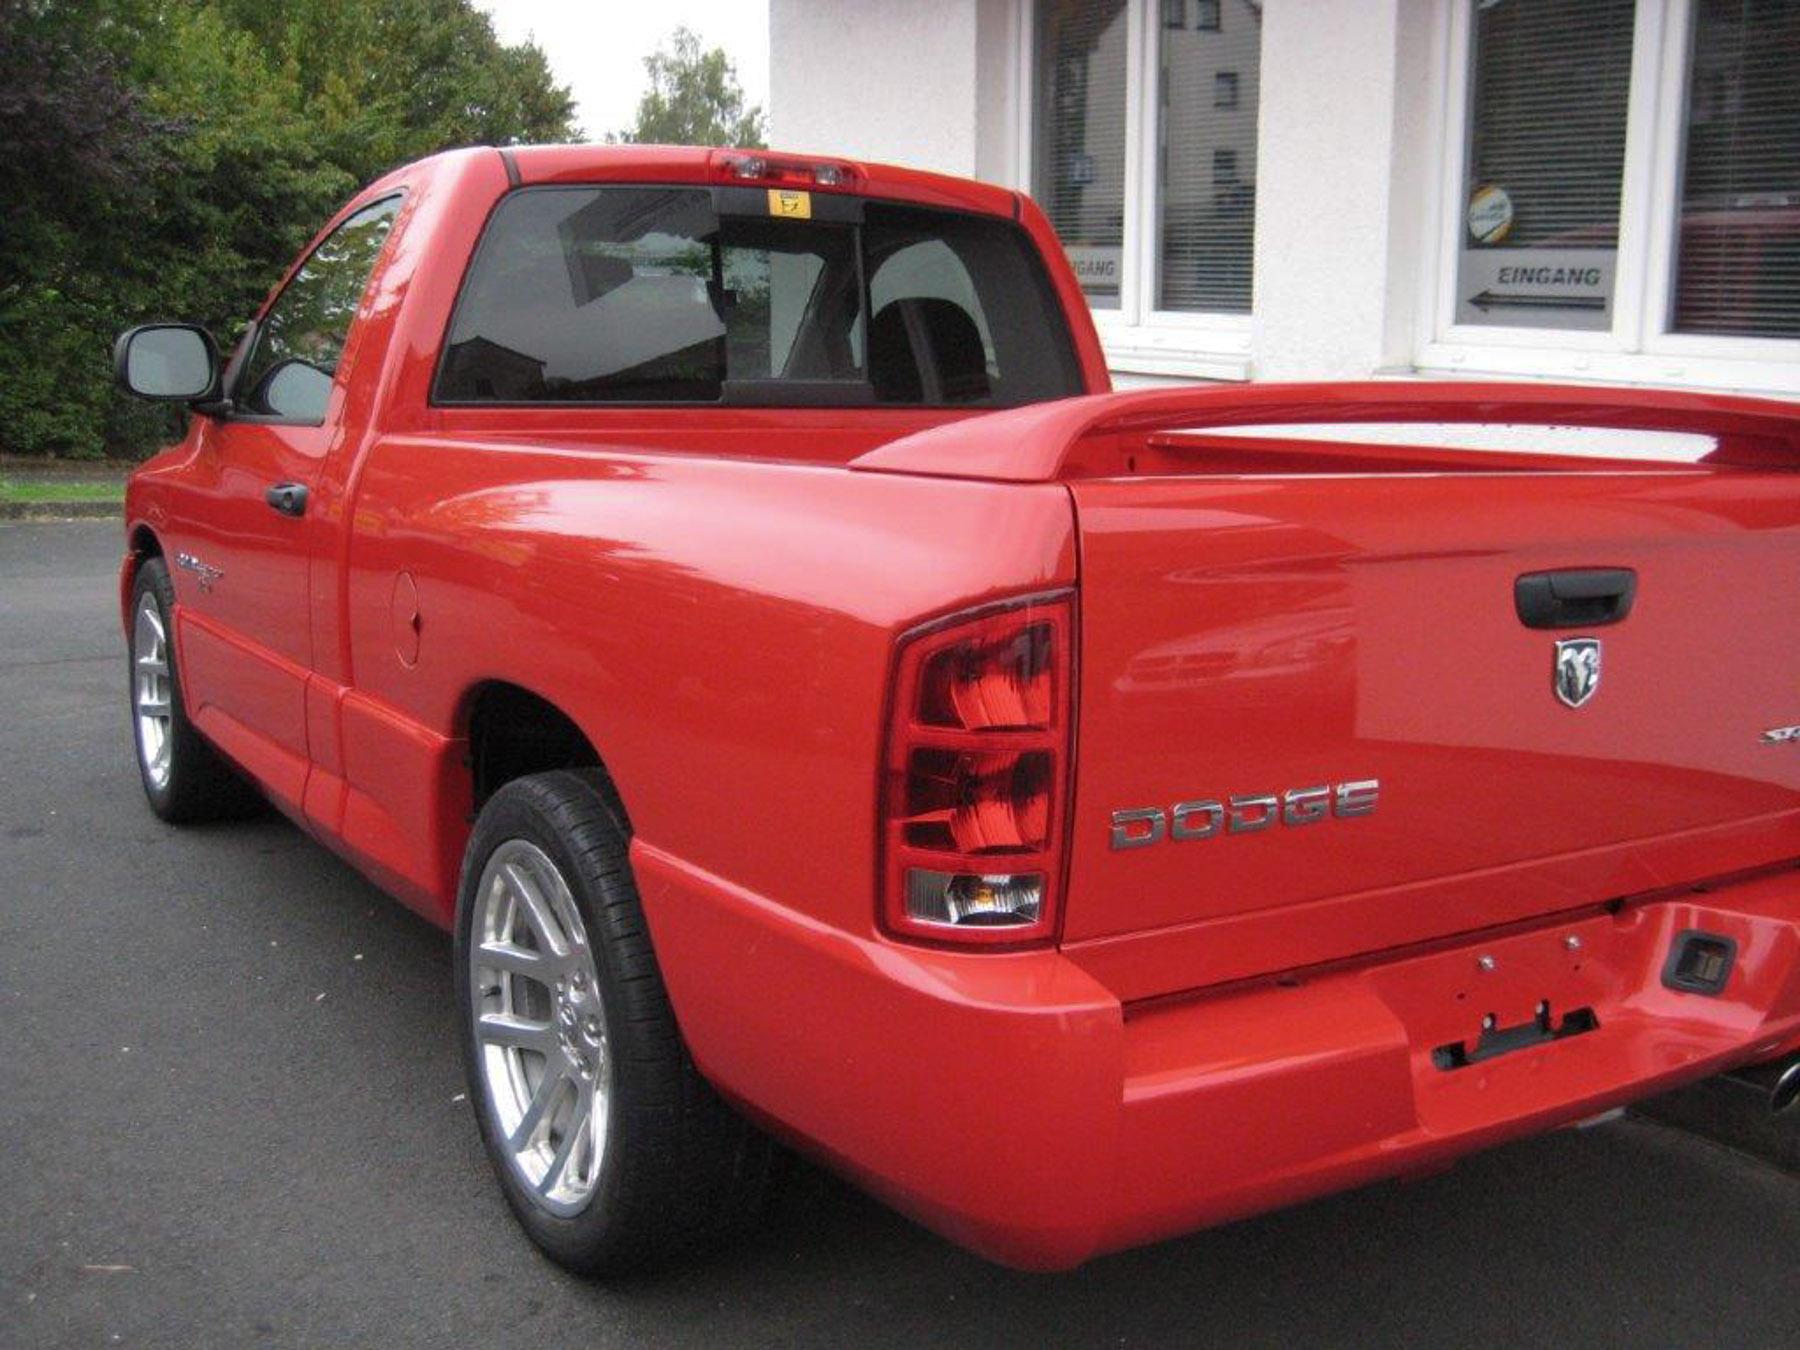 Dodge Ram Srt10 Viper Pickup 5 000 Miles David